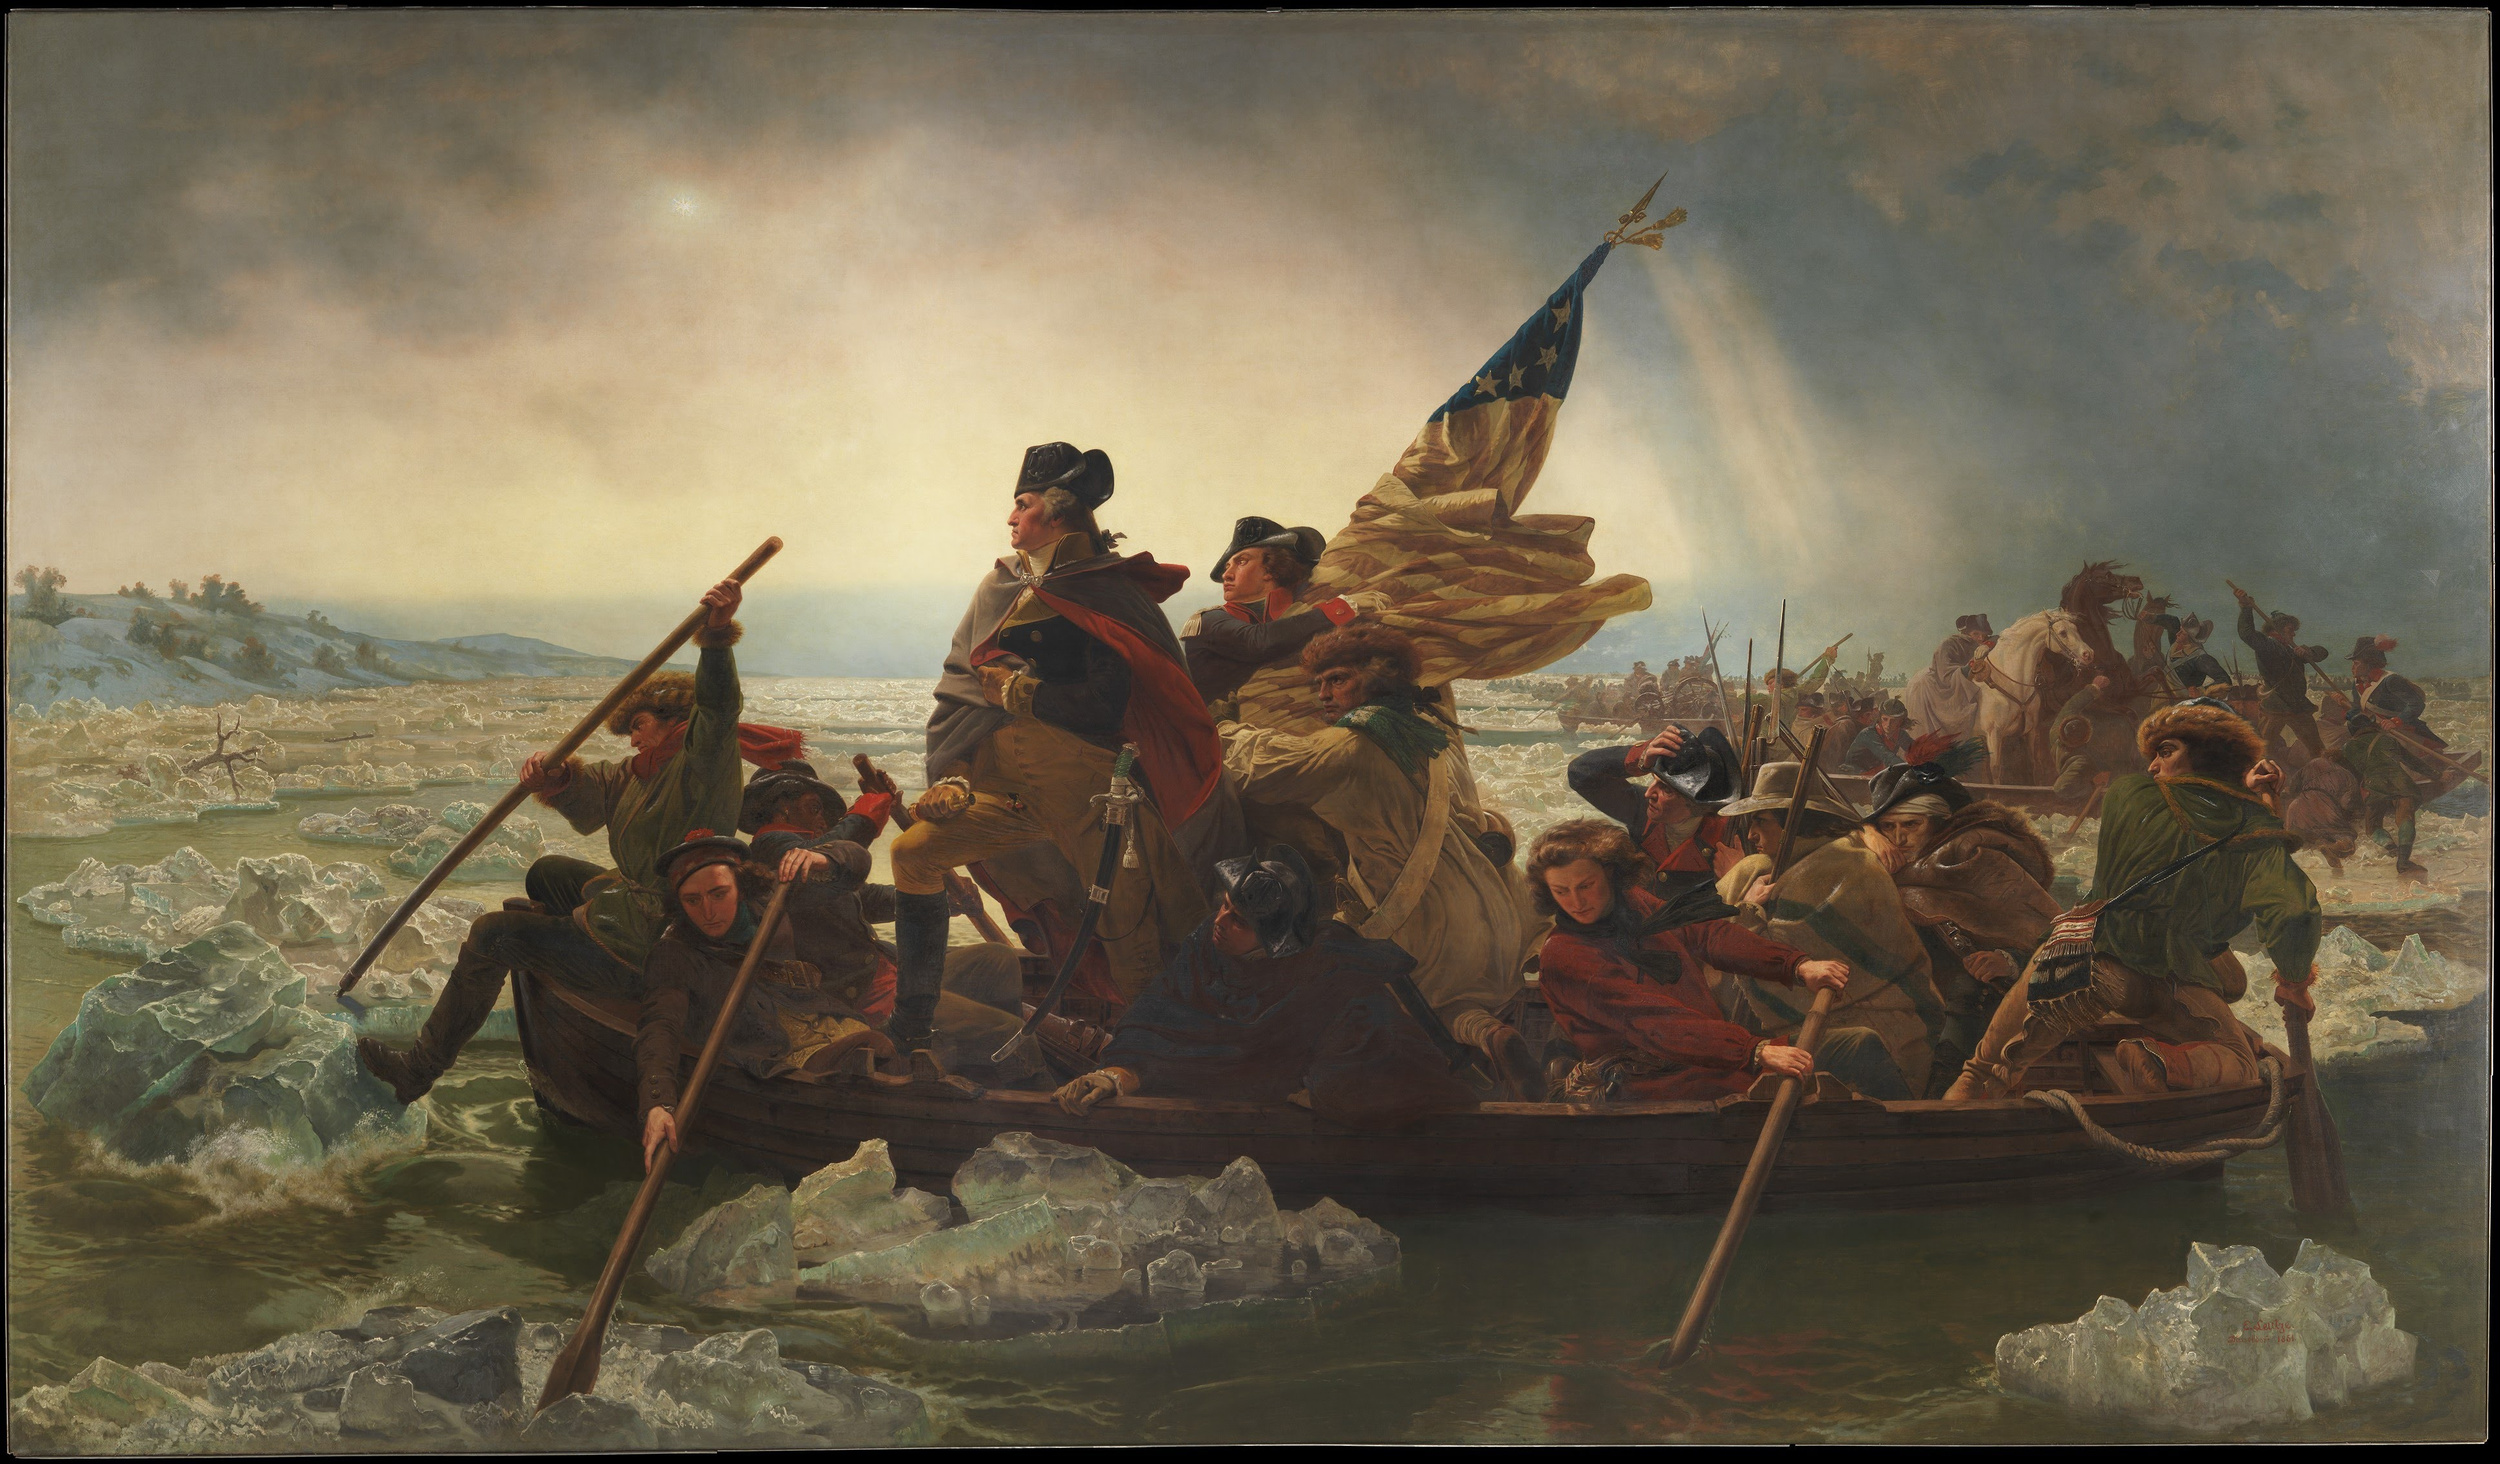 Emanuel_Leutze_(American,_Schwäbisch_Gmünd_1816–1868_Washington,_D.C.)_-_Washington_Crossing_the_Delaware_-_Google_Art_Project.jpg